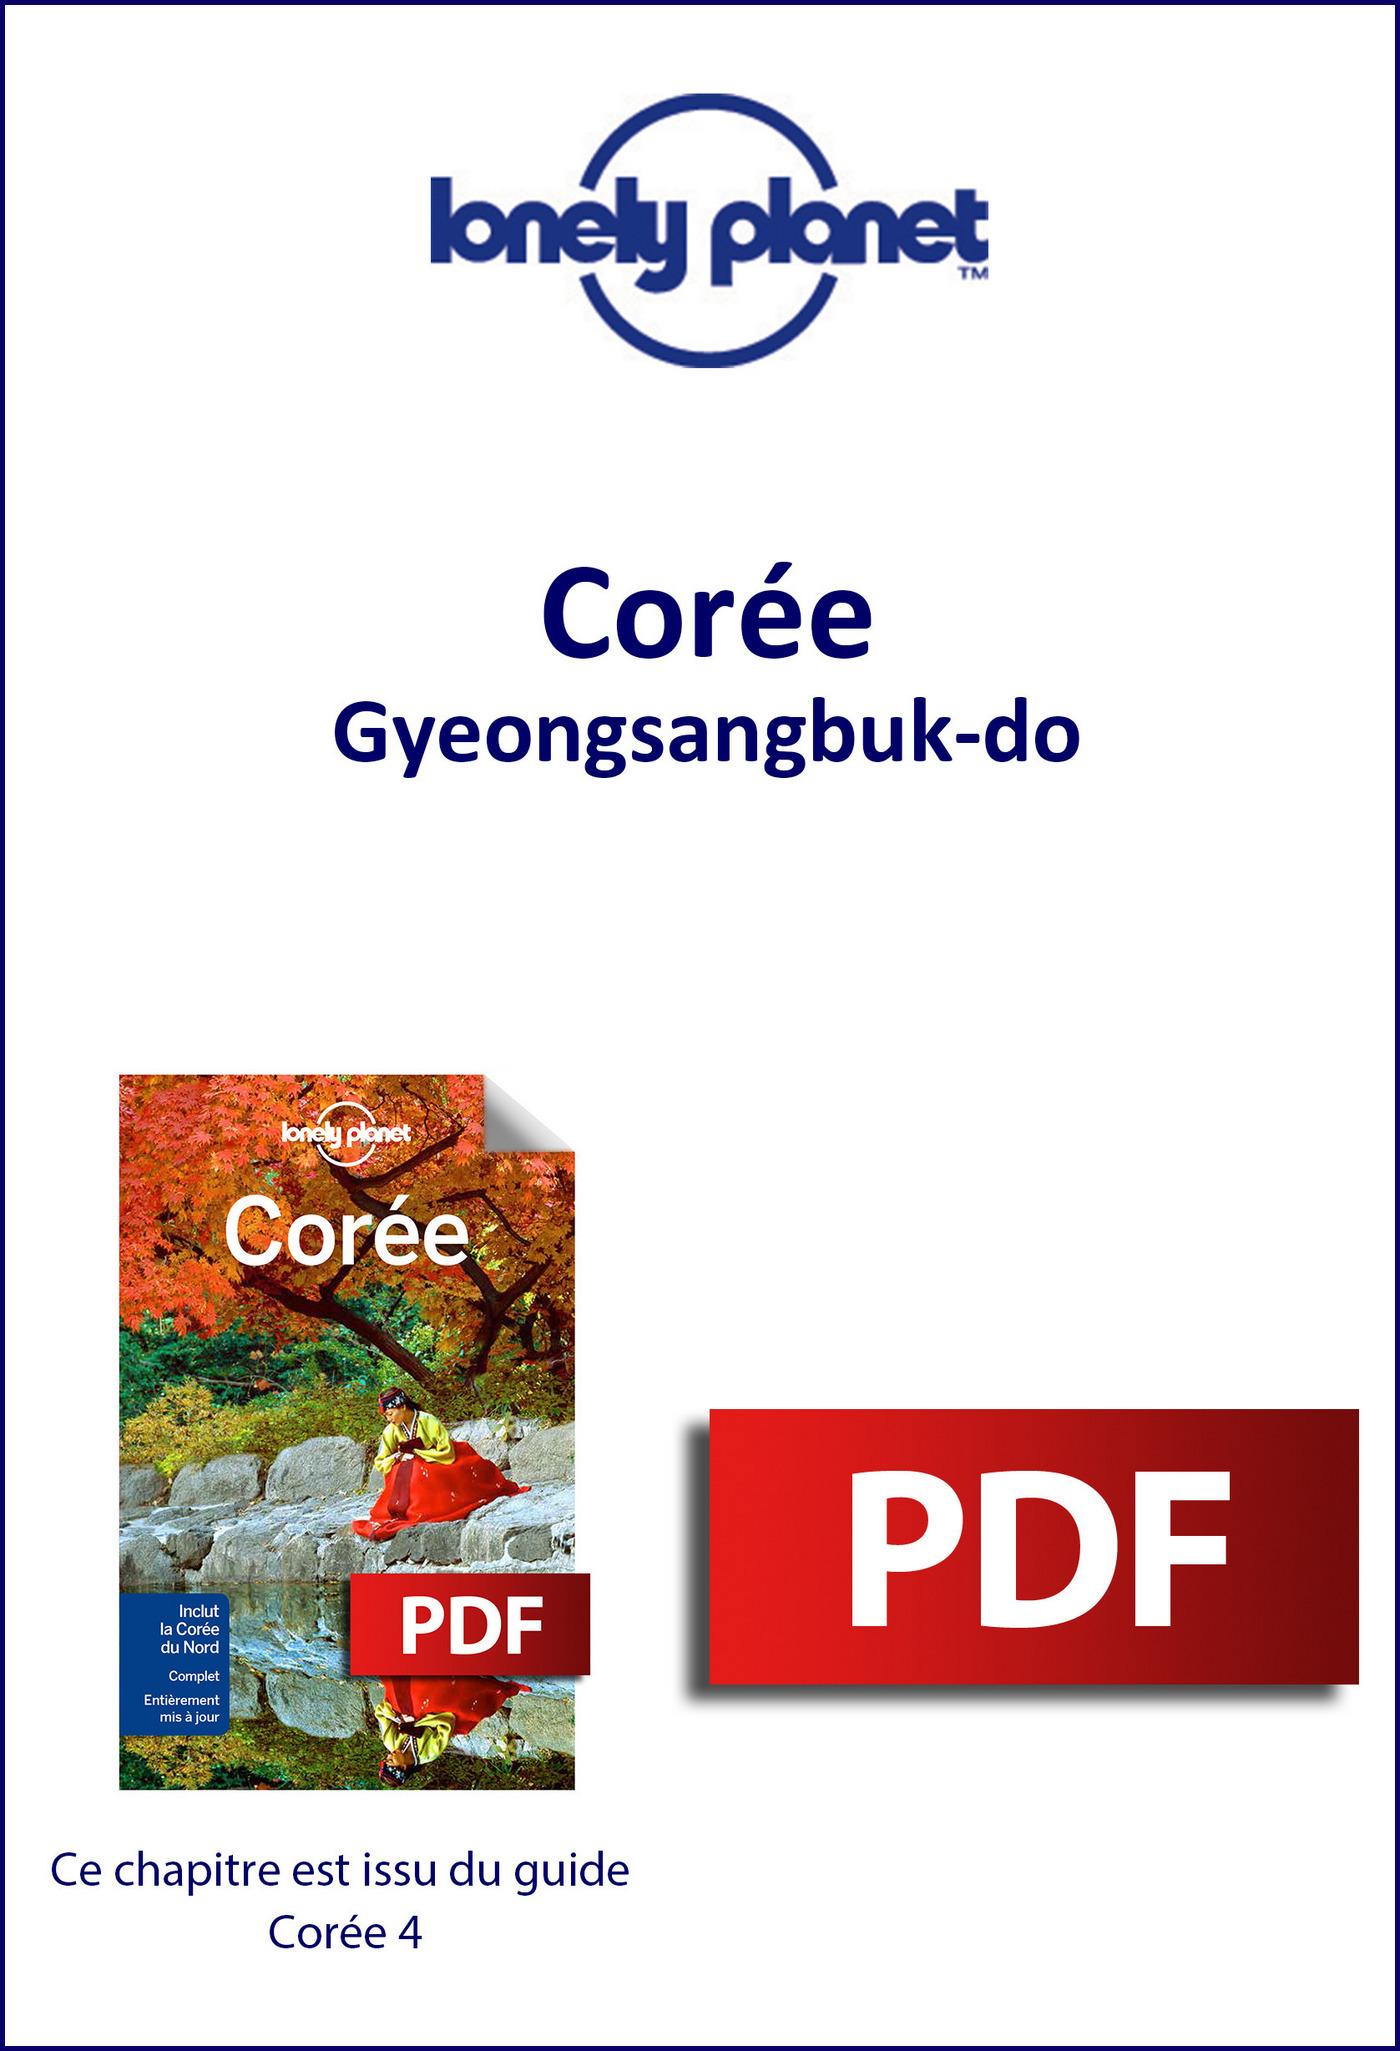 Corée - Gyeongsangbuk-do